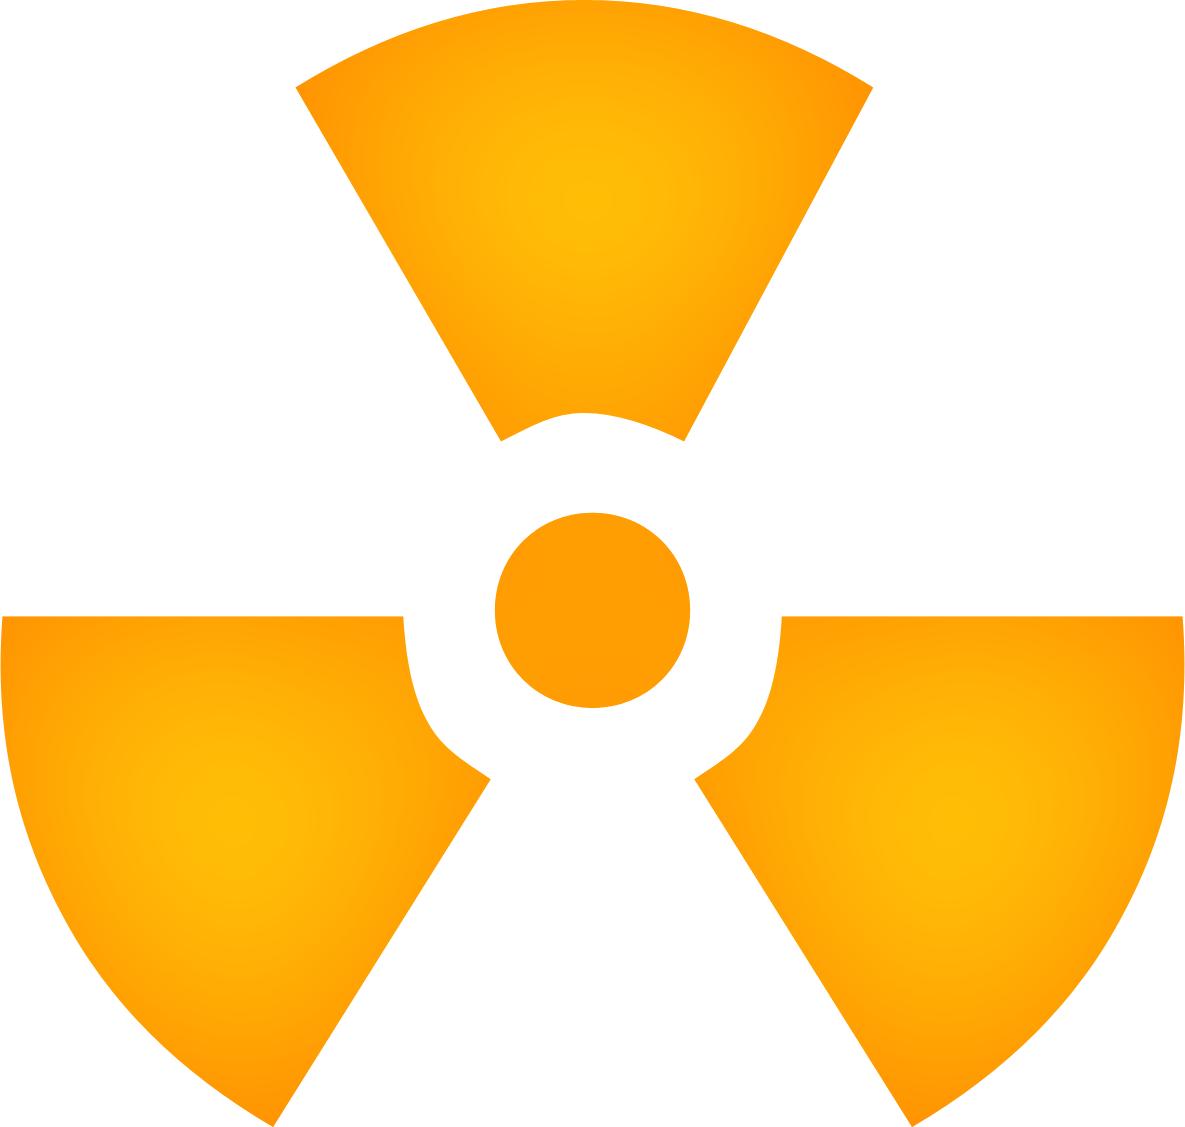 Yellow Radiation Sign